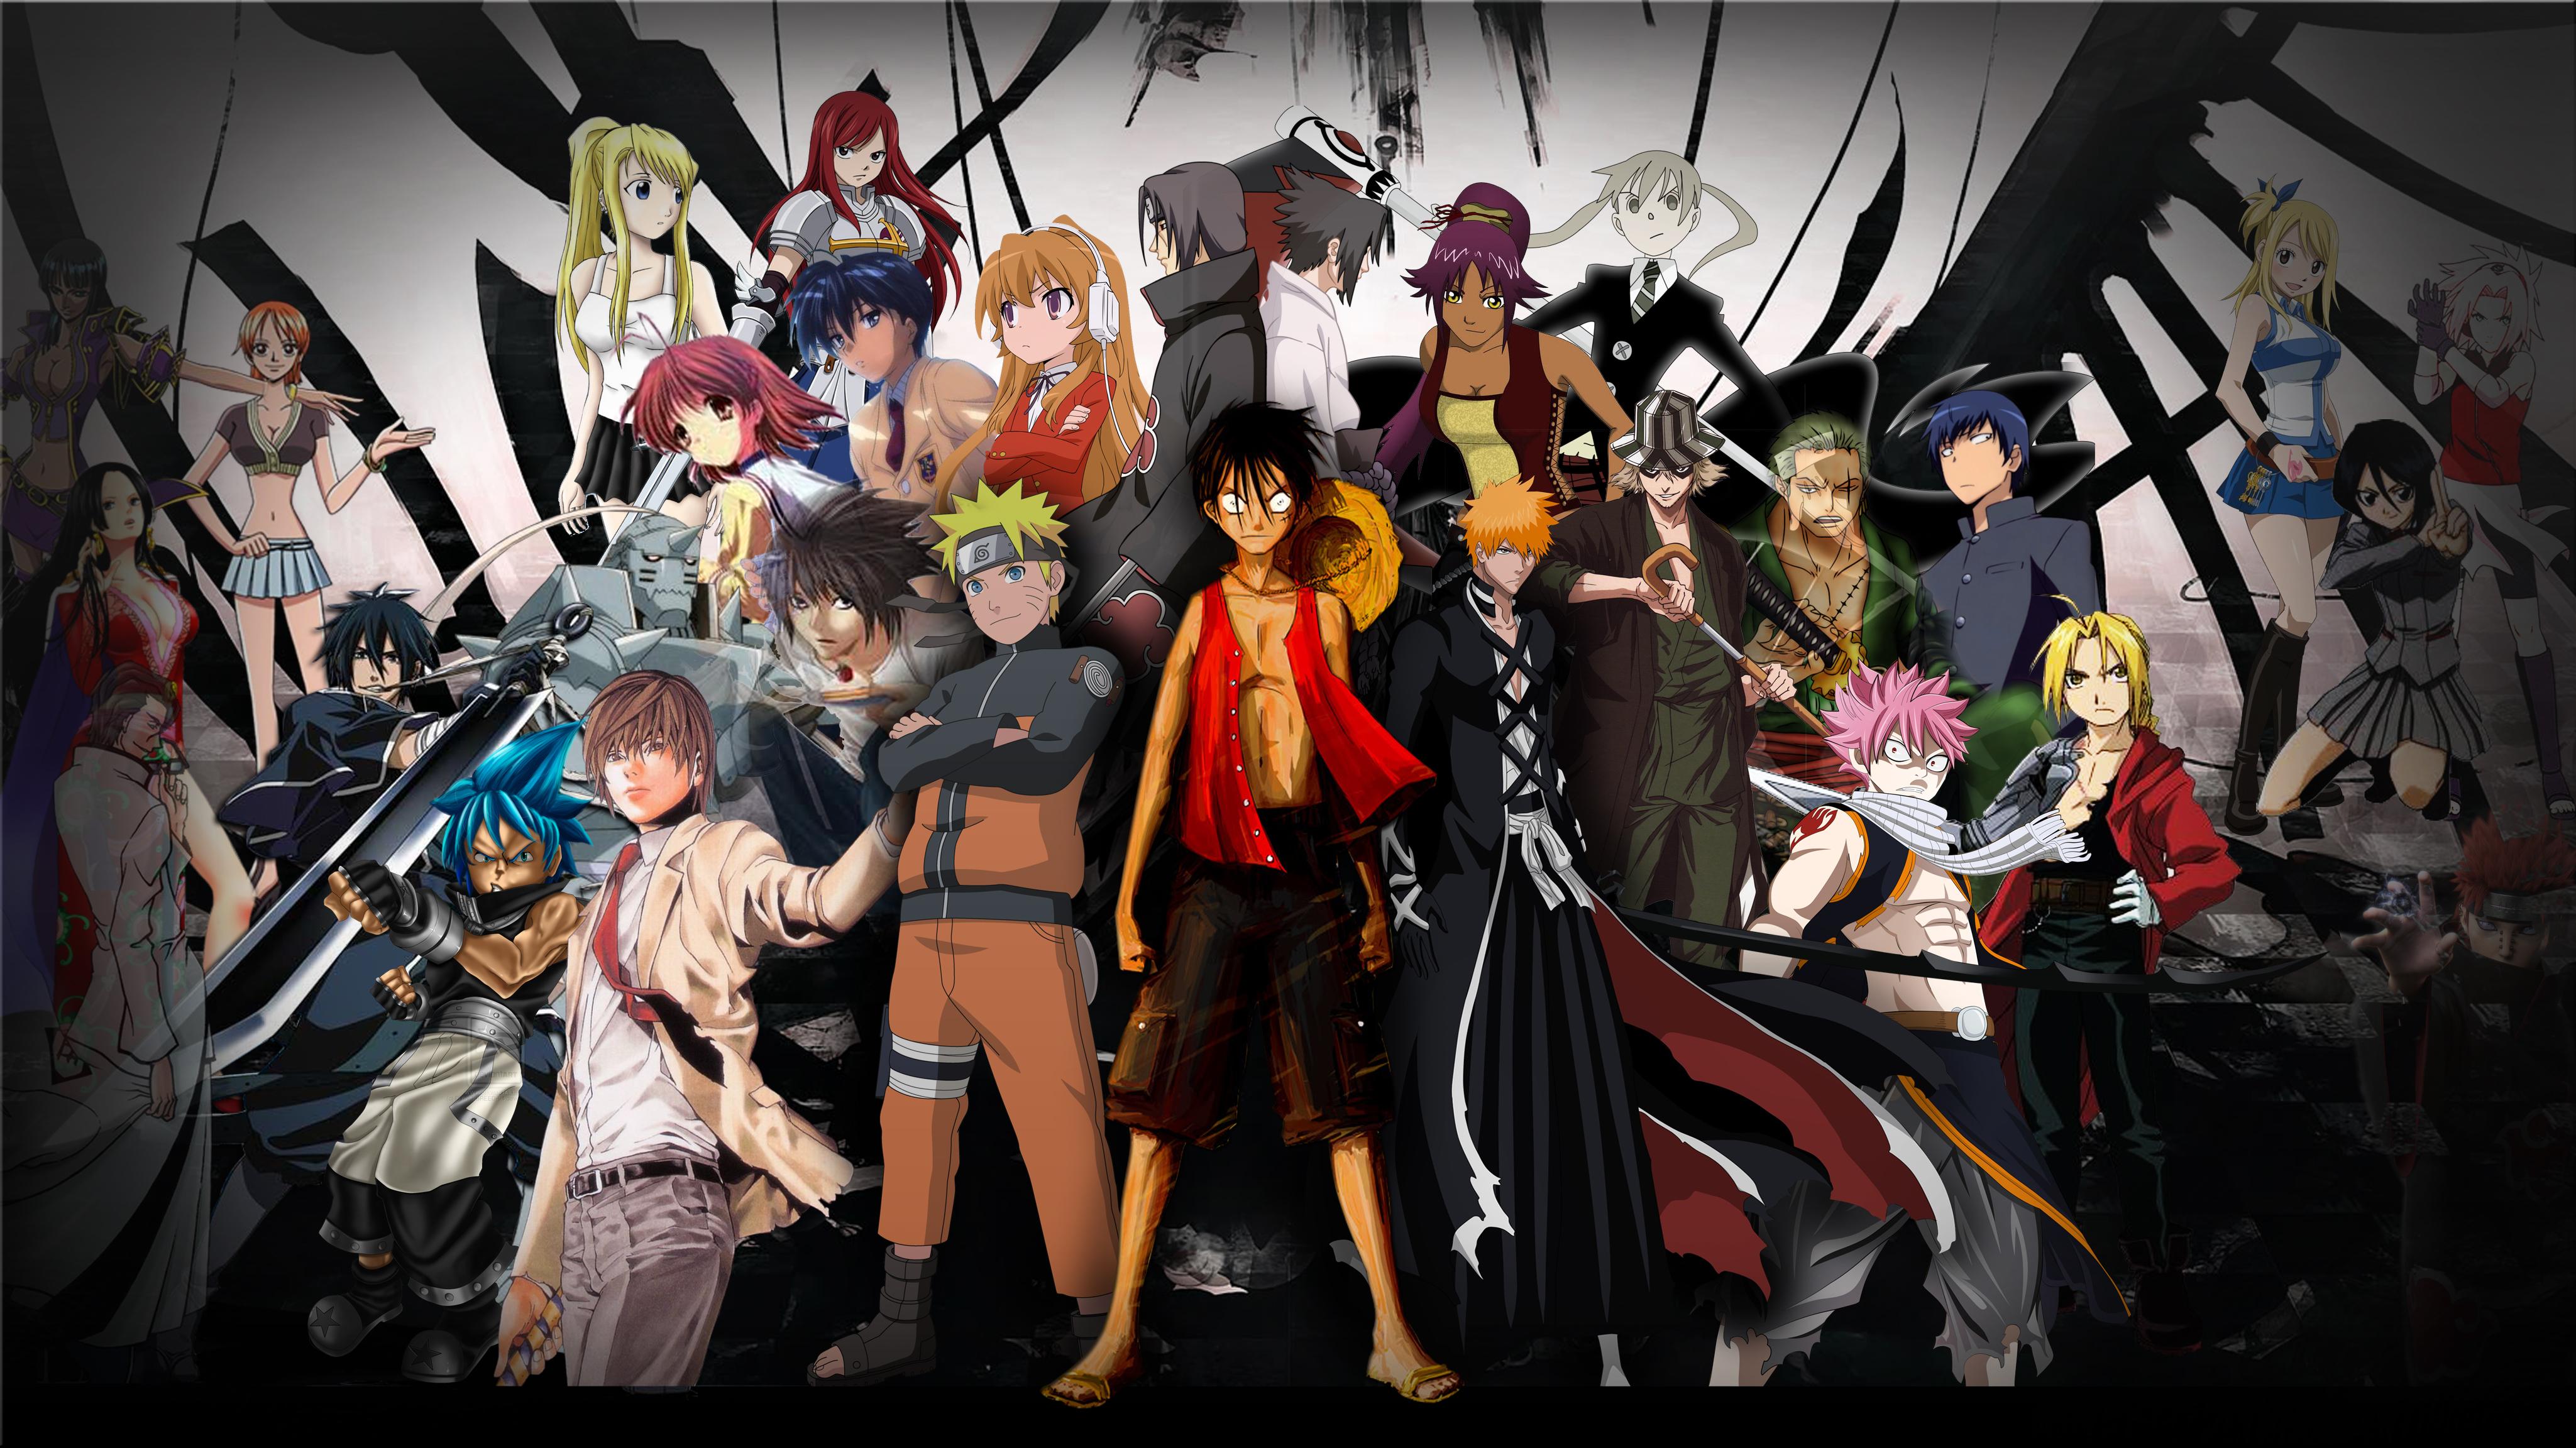 Anime Mix HD Wallpaper 664 Wallpaper Viewallpapercom 4098x2304